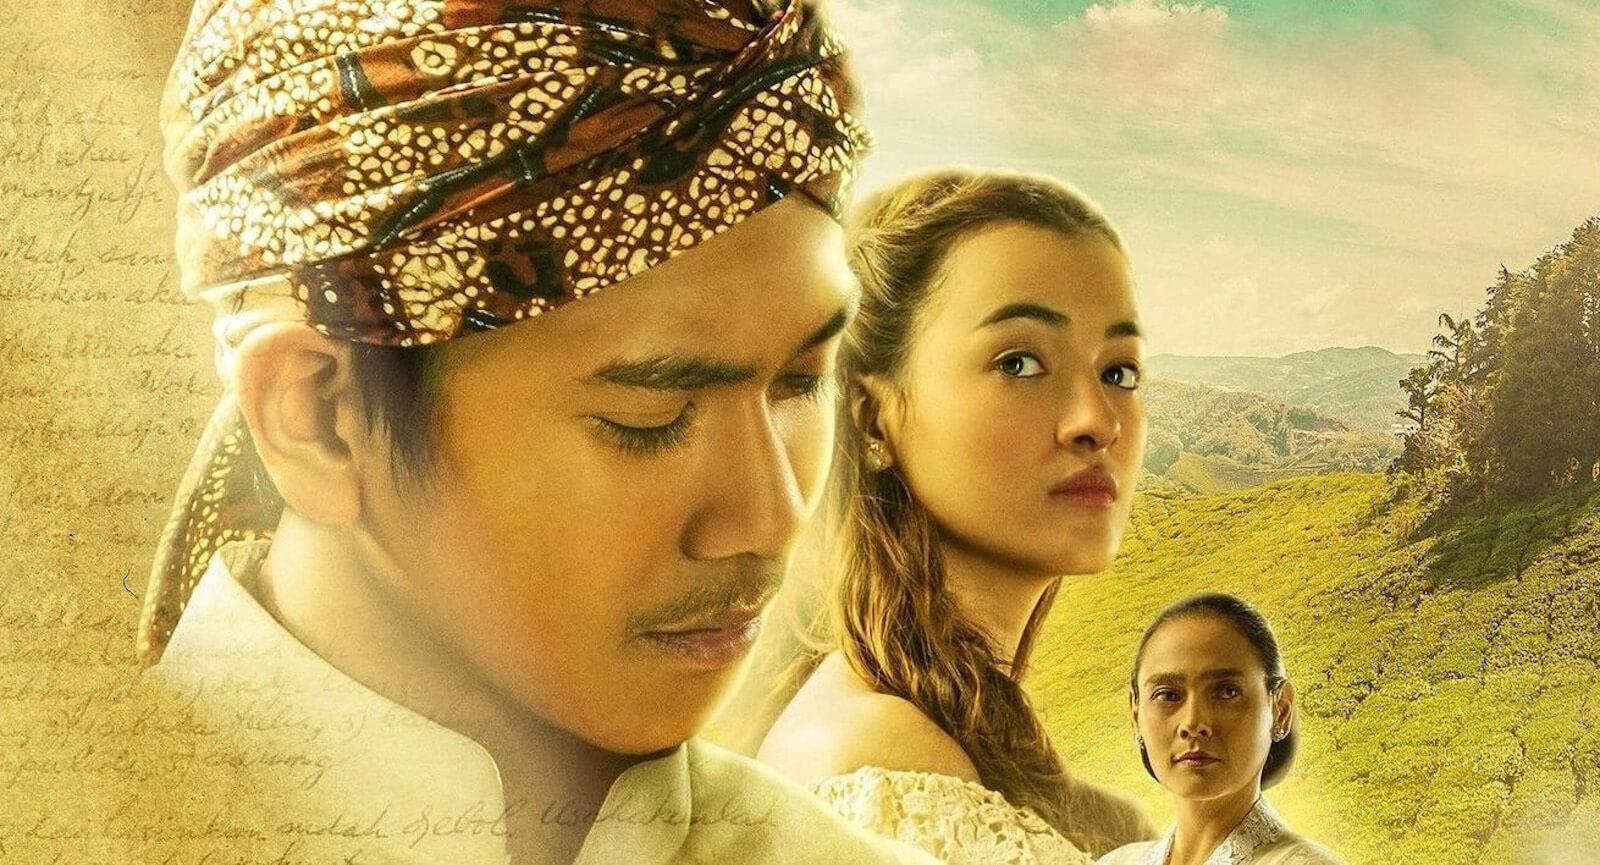 Bumi Manusia - Netflix Dirangkul Mas Nadiem, Nonton Lagi Film Romantis Terbaik 2019 Yuk.jpg